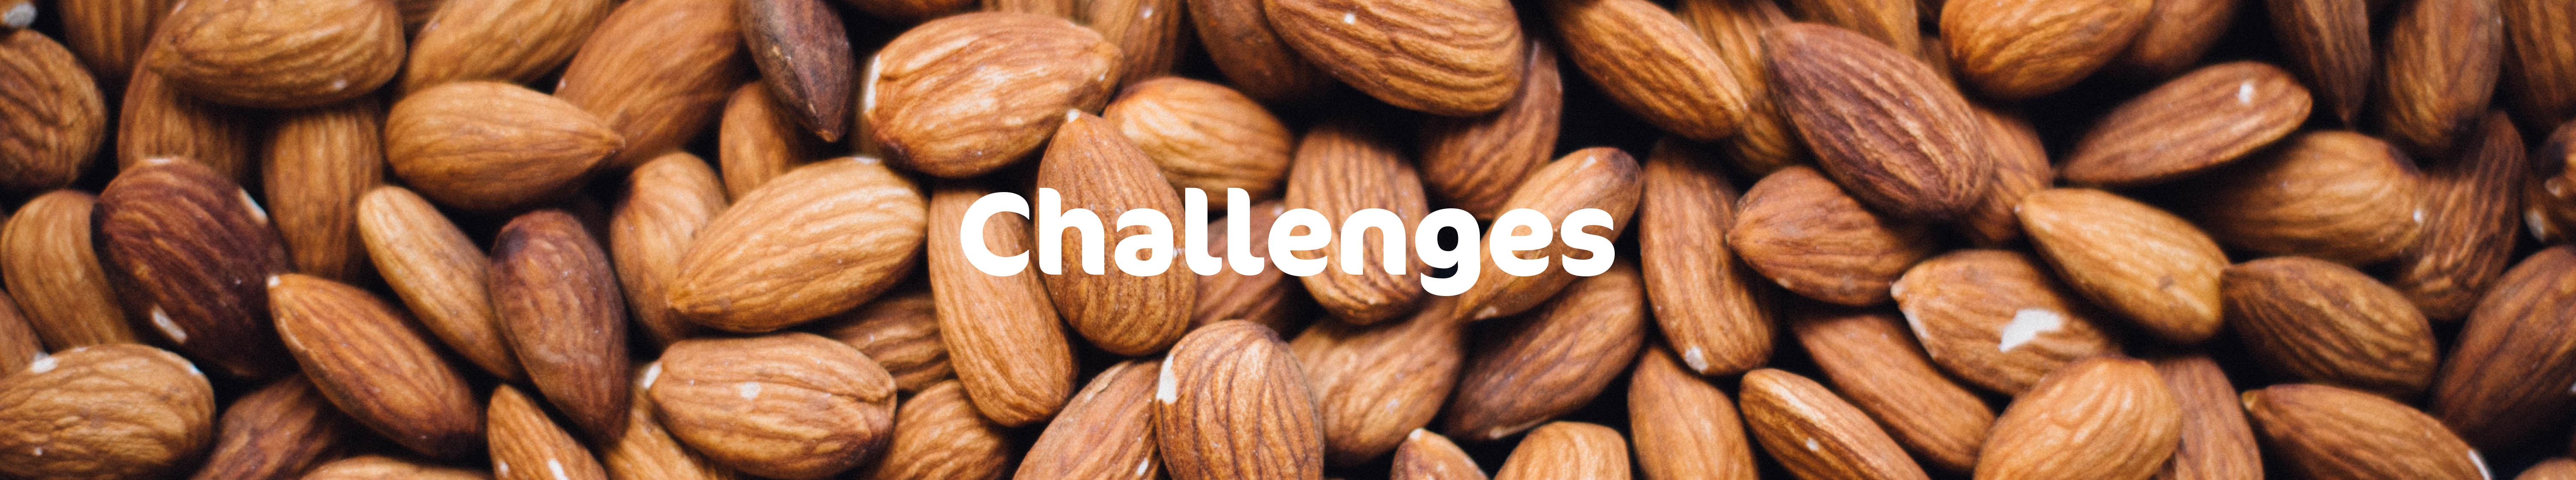 header_challenges